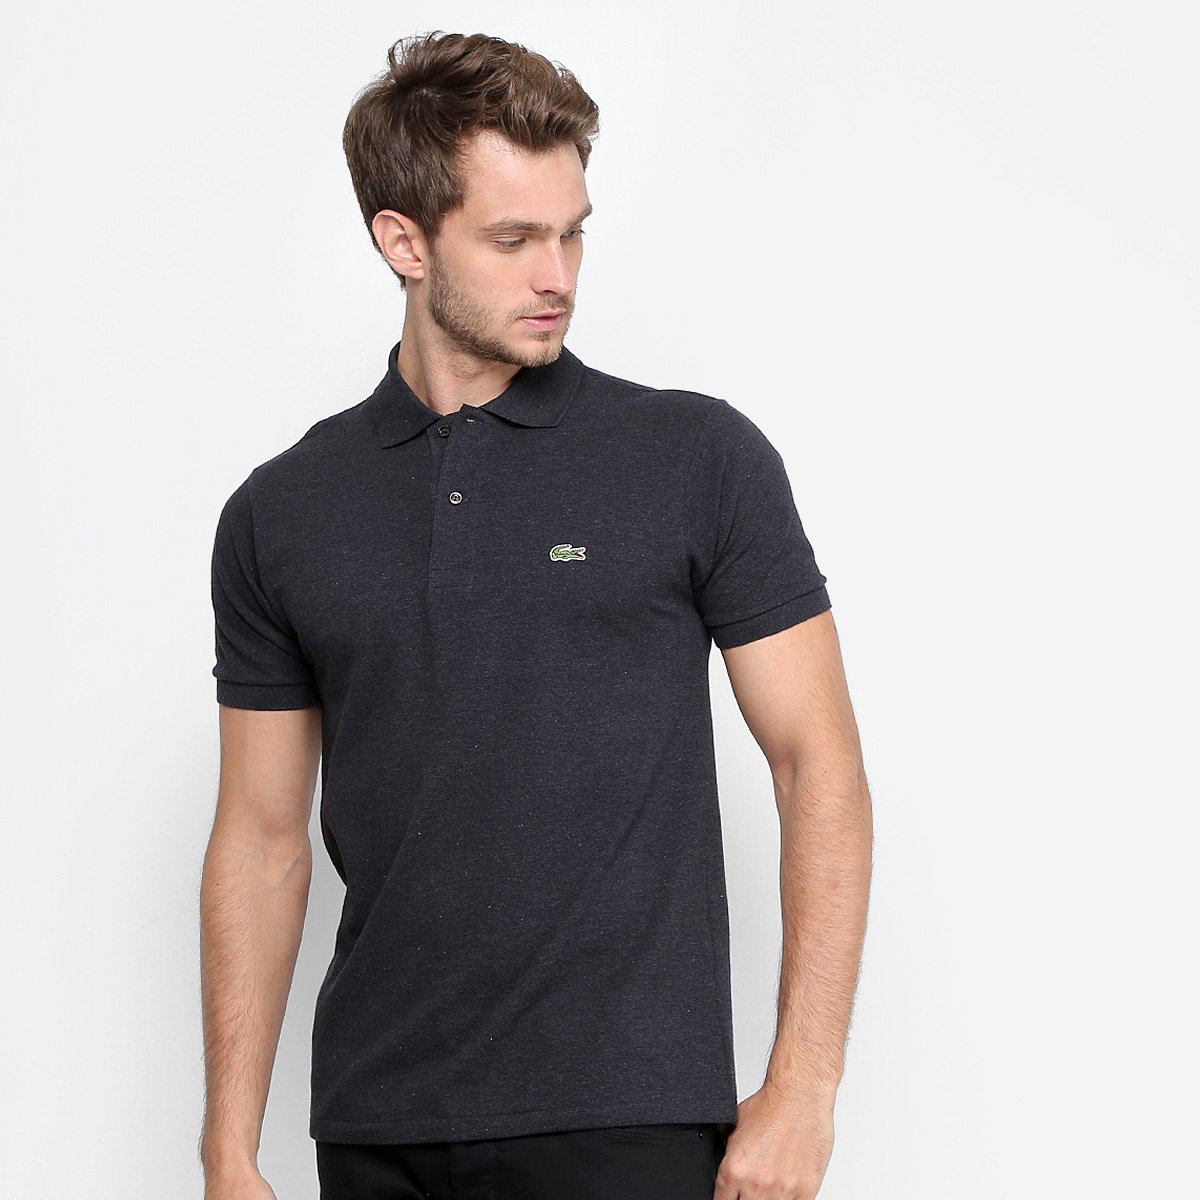 7f2da7b85d18f Camisa Polo Lacoste Piquet Masculina - Compre Agora